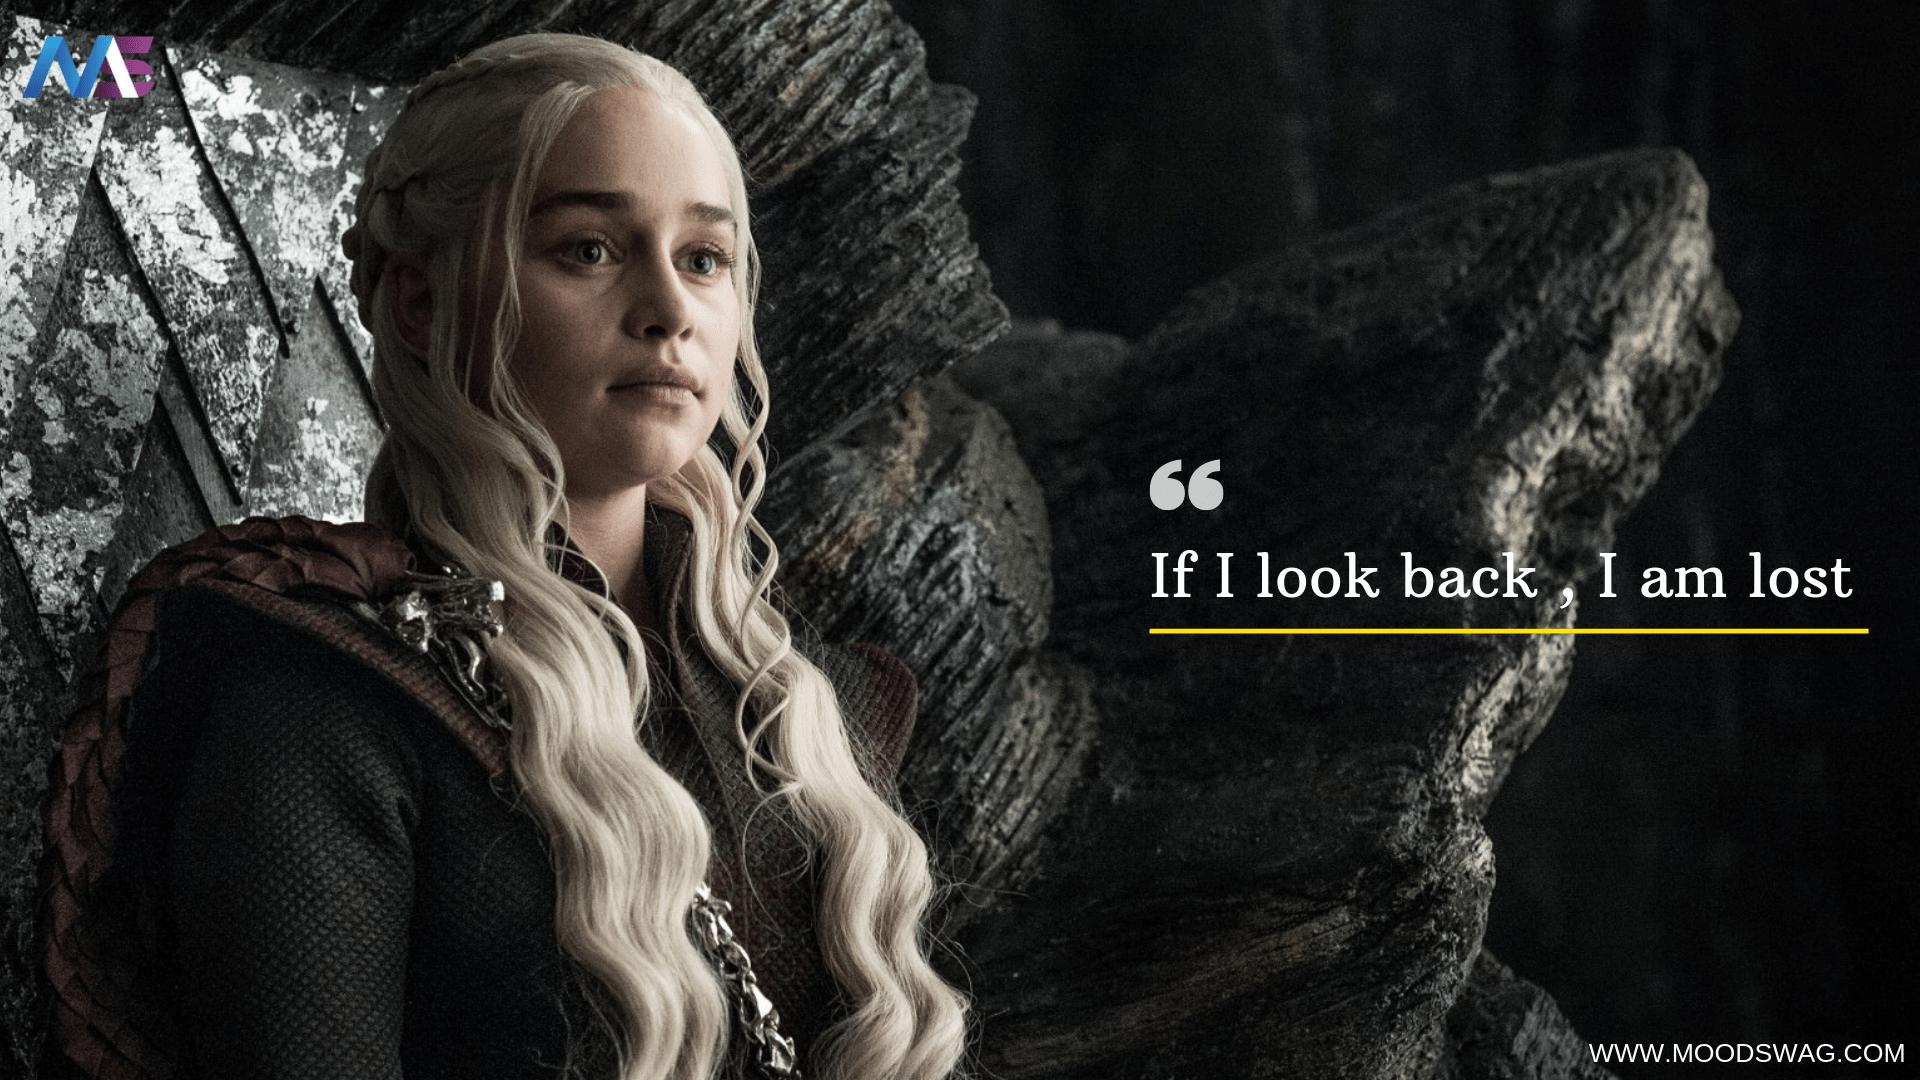 Daenerys Targaryen Awesome Quotes